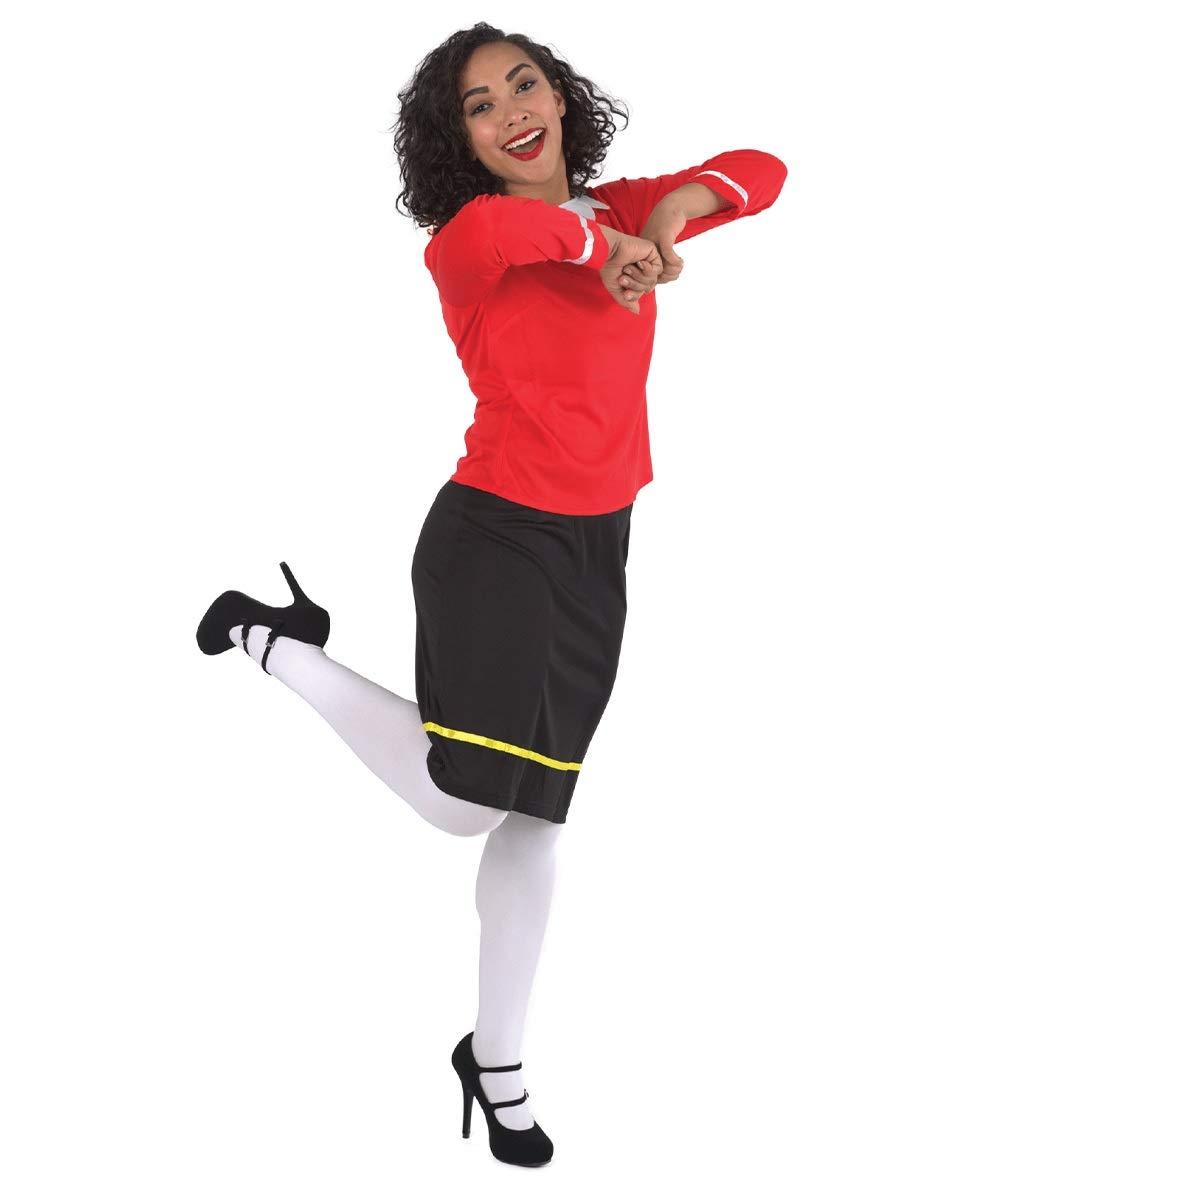 The Costume Center Disfraz de Mujer Marinera Negra y roja ...